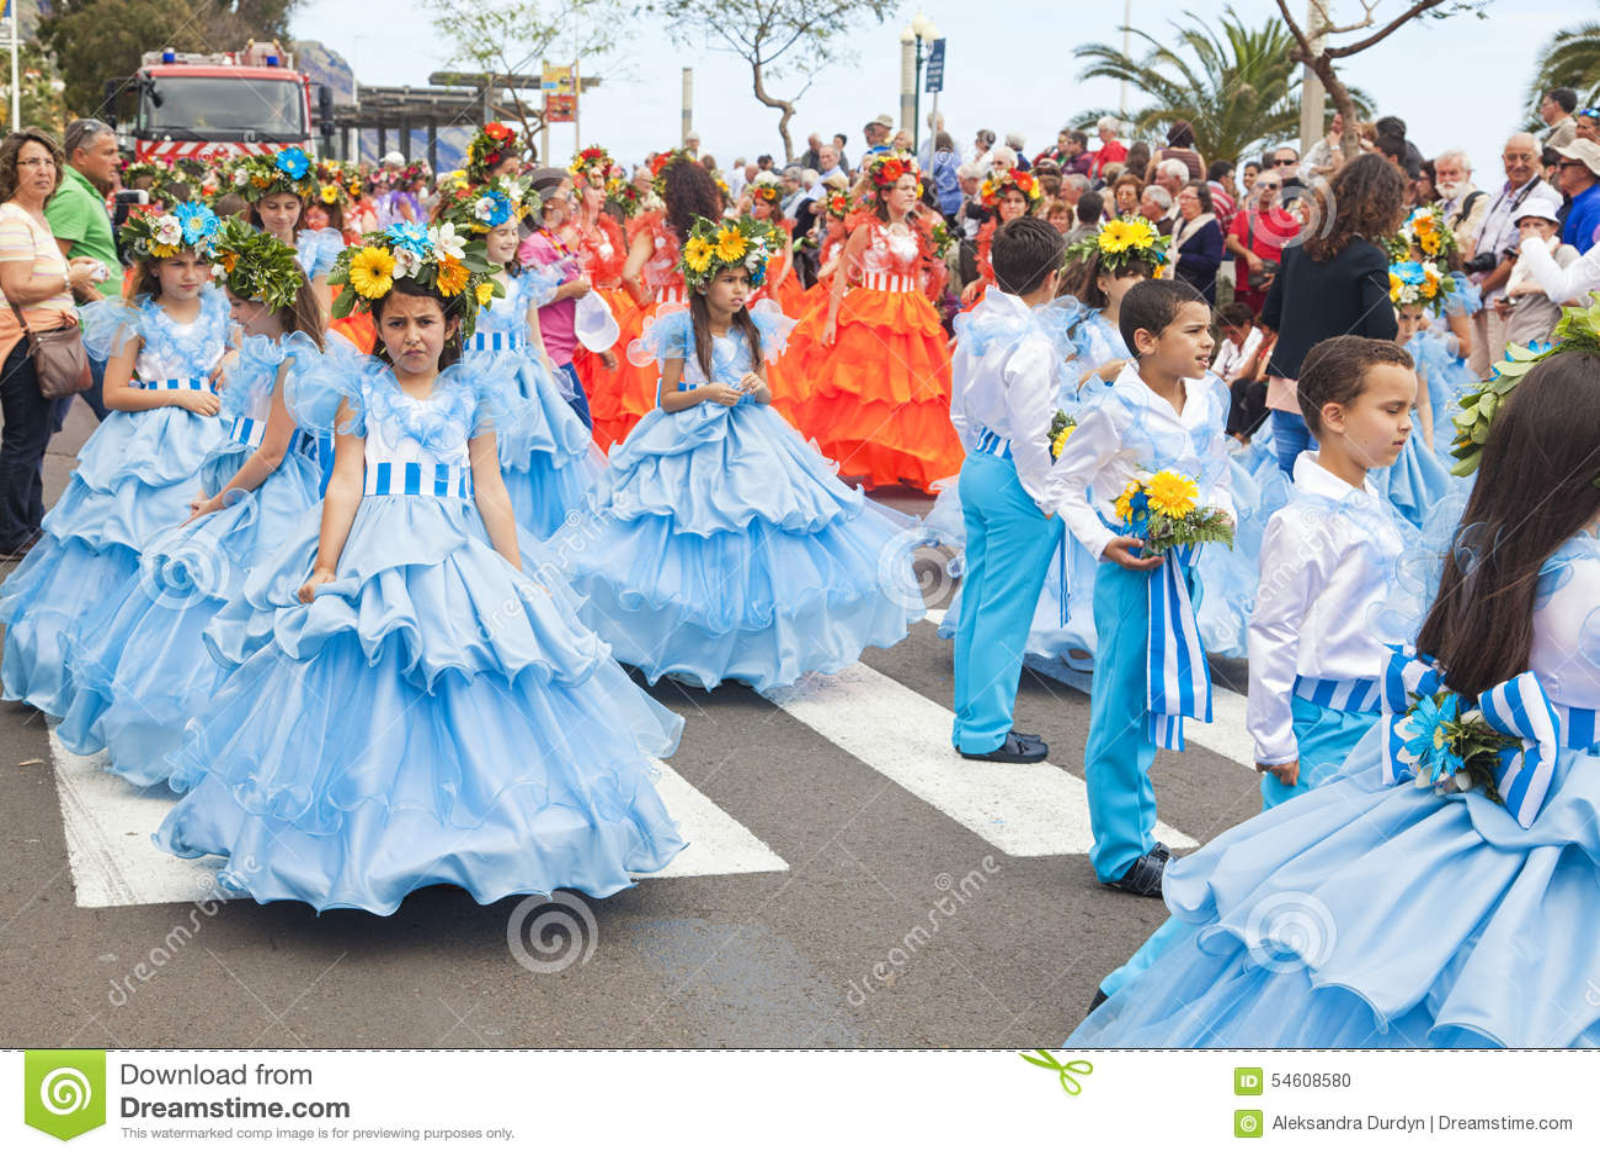 Funchal, Madera - April 20, 2015: Uitvoerders met kleurrijke en gedetailleerde kostuums die aan de Parade van Bloemfestival deeln